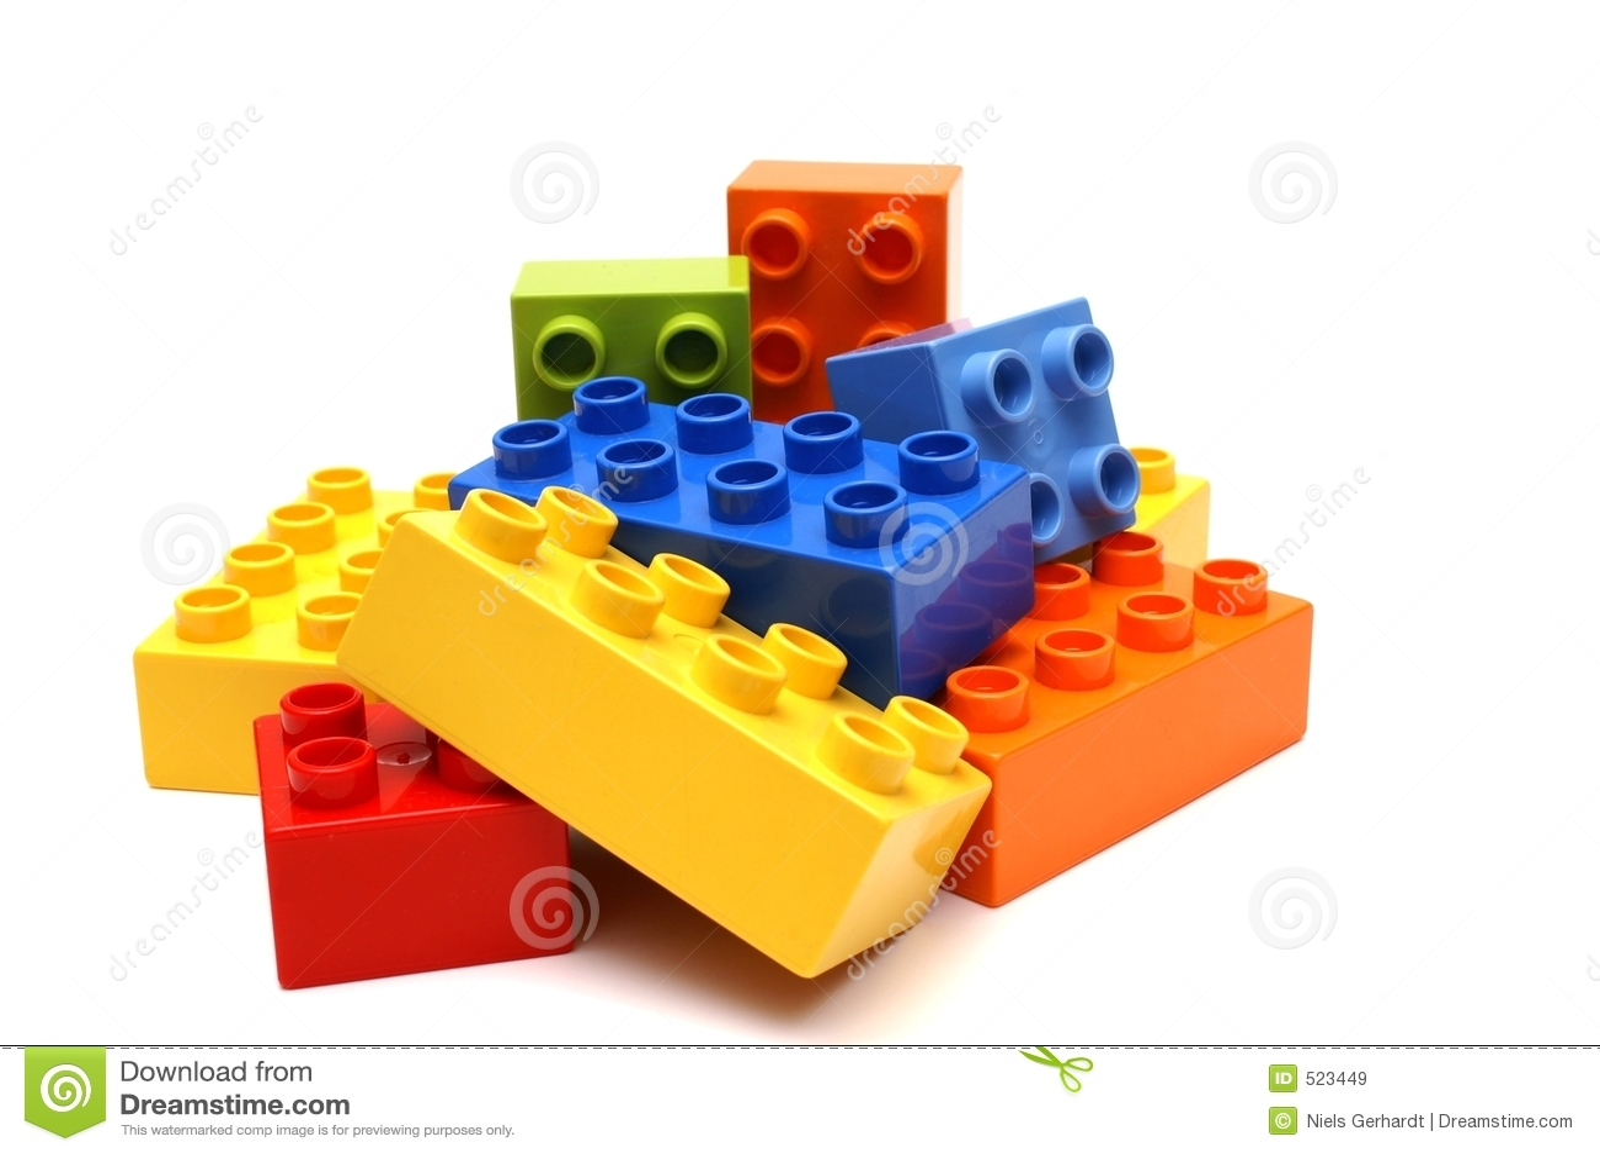 blocs de lego image stock image du pi ce blocs construction 523449. Black Bedroom Furniture Sets. Home Design Ideas